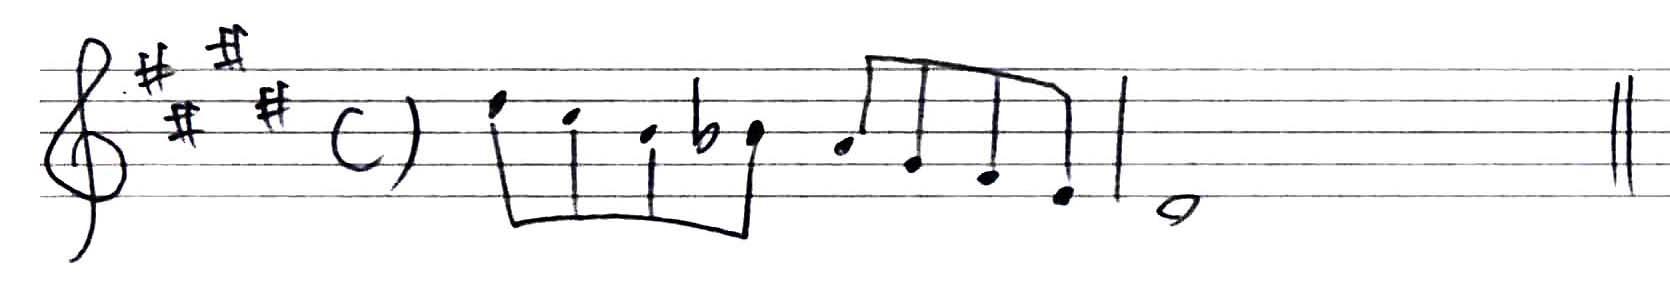 transposition-2-Eb